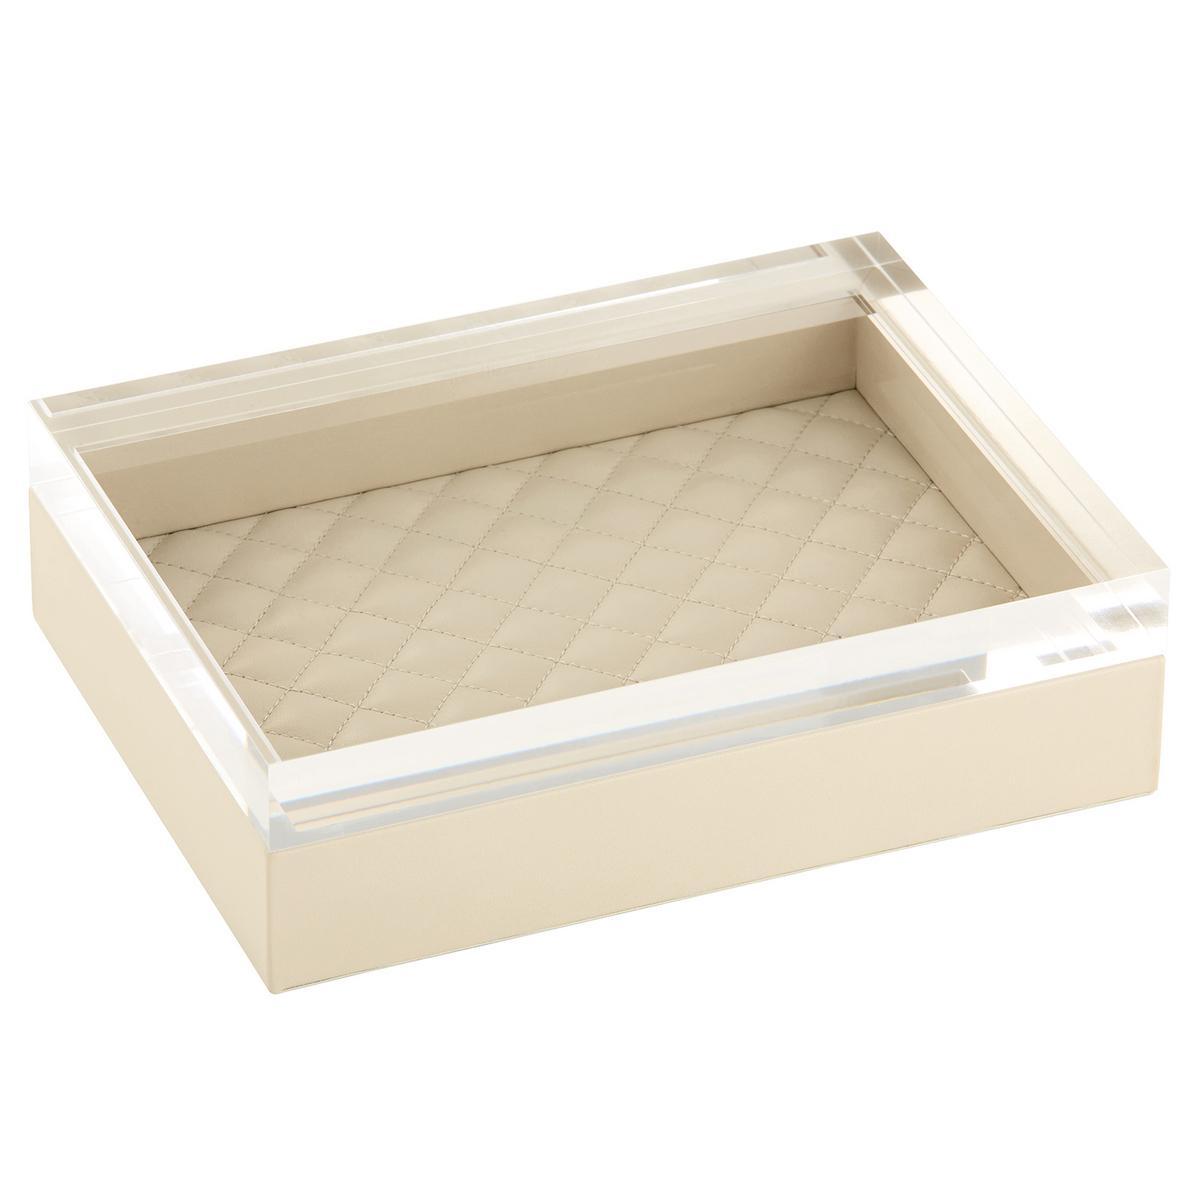 Acrylic Box Lid : Riviere leather boxes with acrylic lid artedona